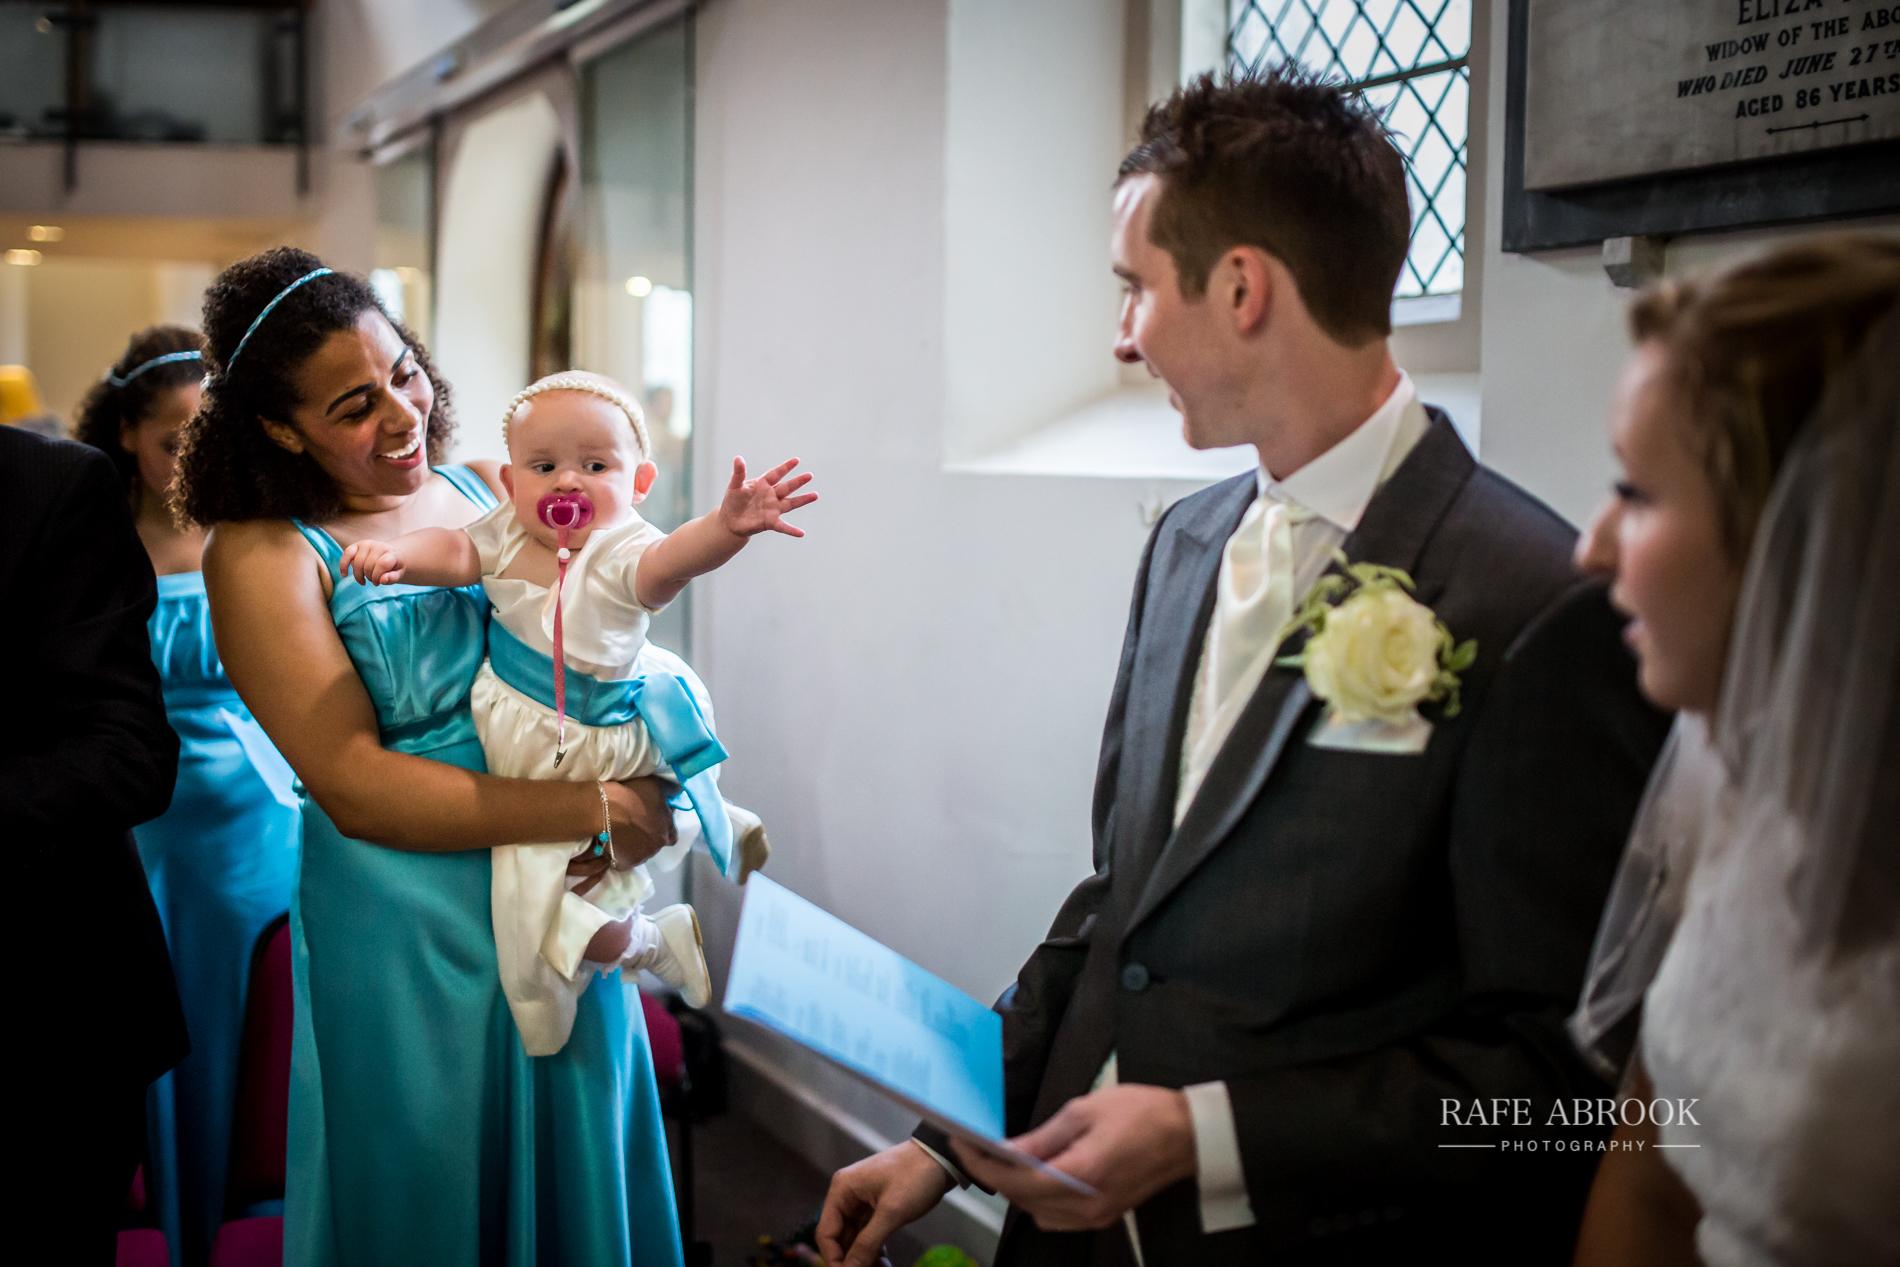 wedding photographer hertfordshire noke thistle hotel st albans -1119.jpg